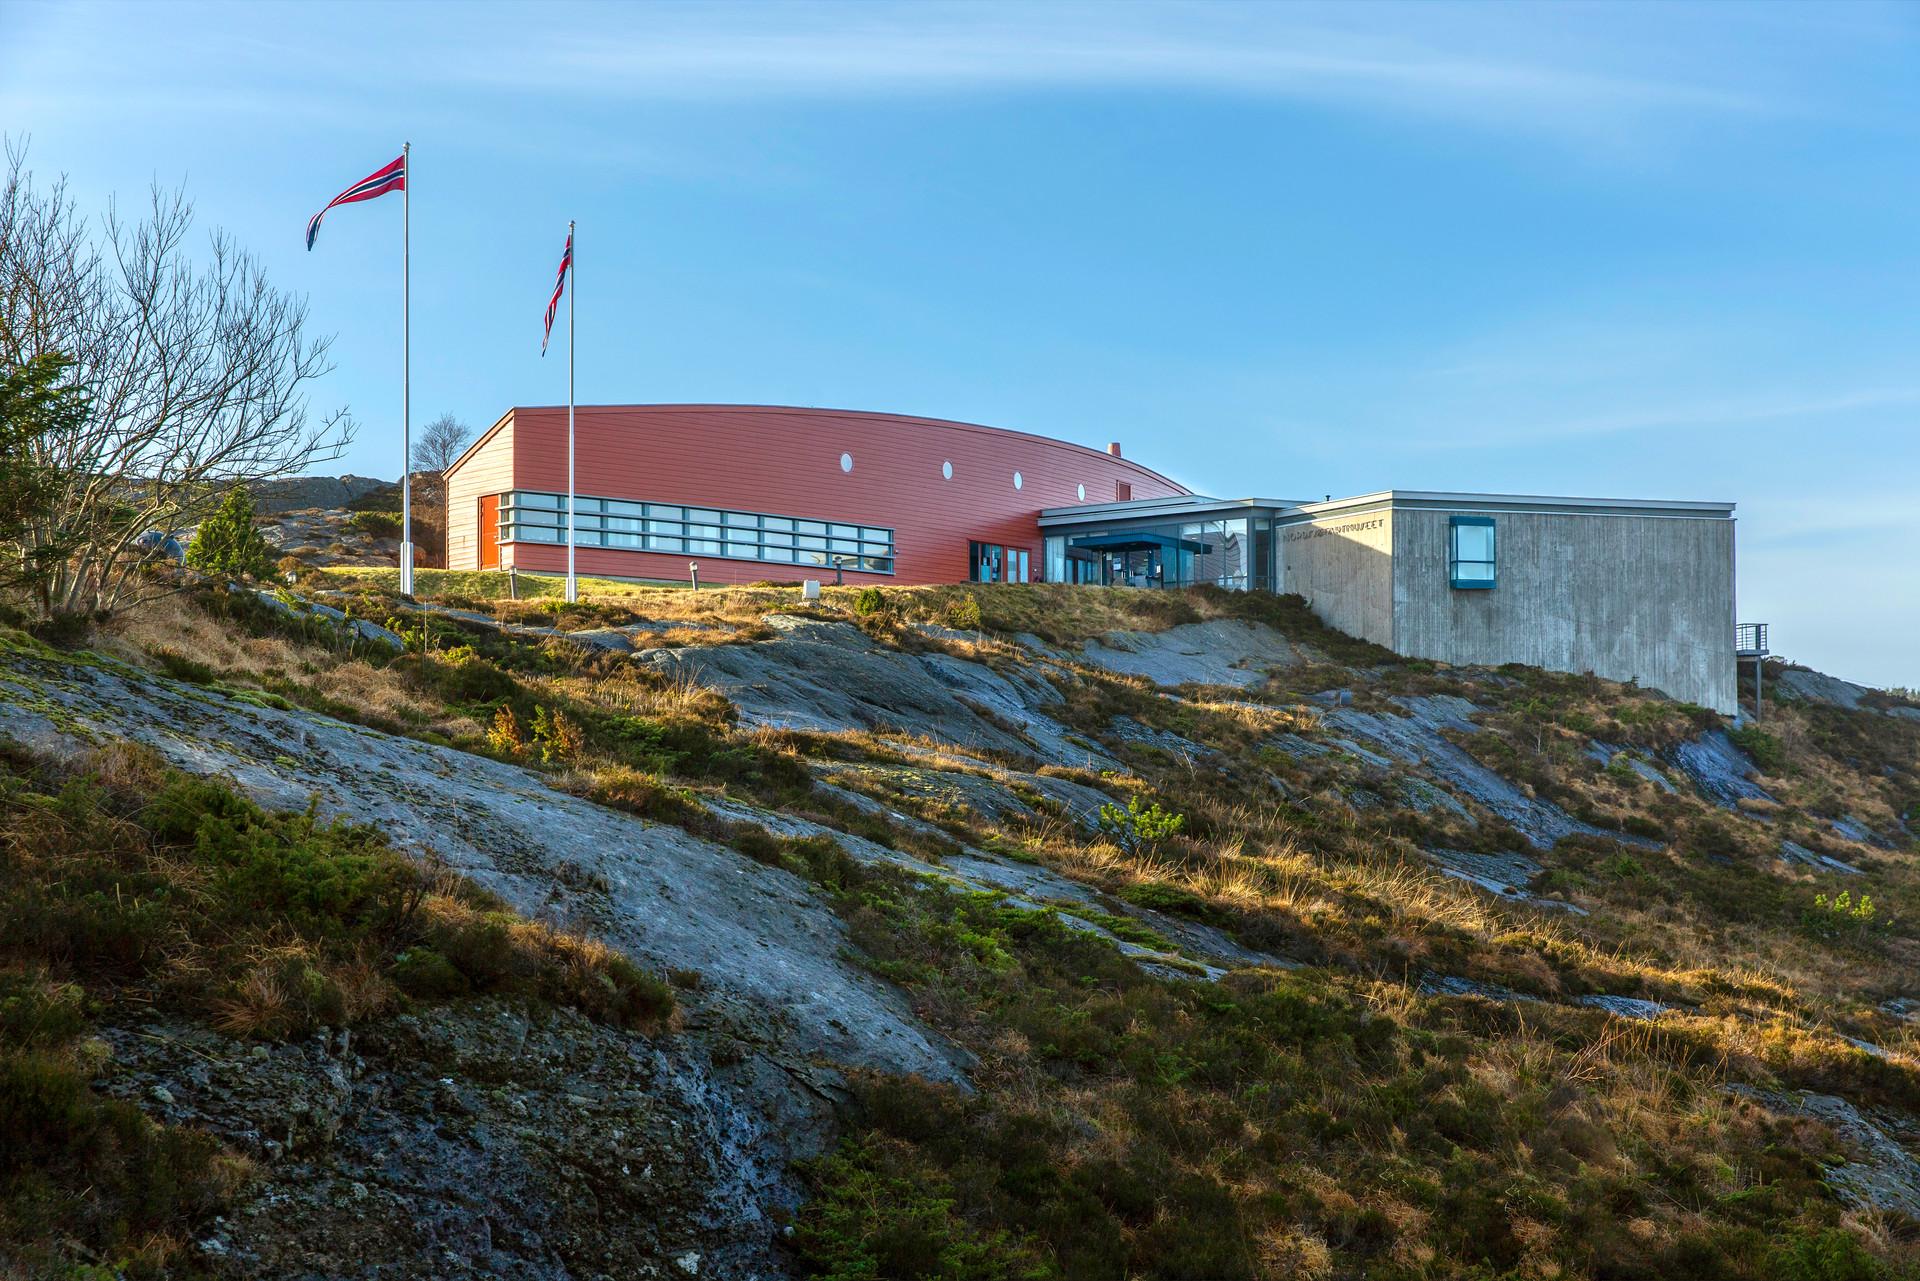 01-Kahrs-ny-Nordsjøfartmuseet-0633.jpg